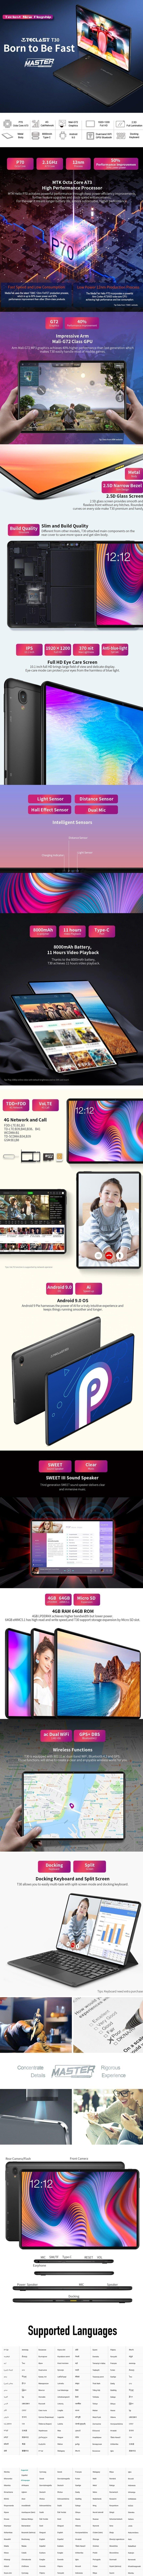 Teclast T30 4G Tablet